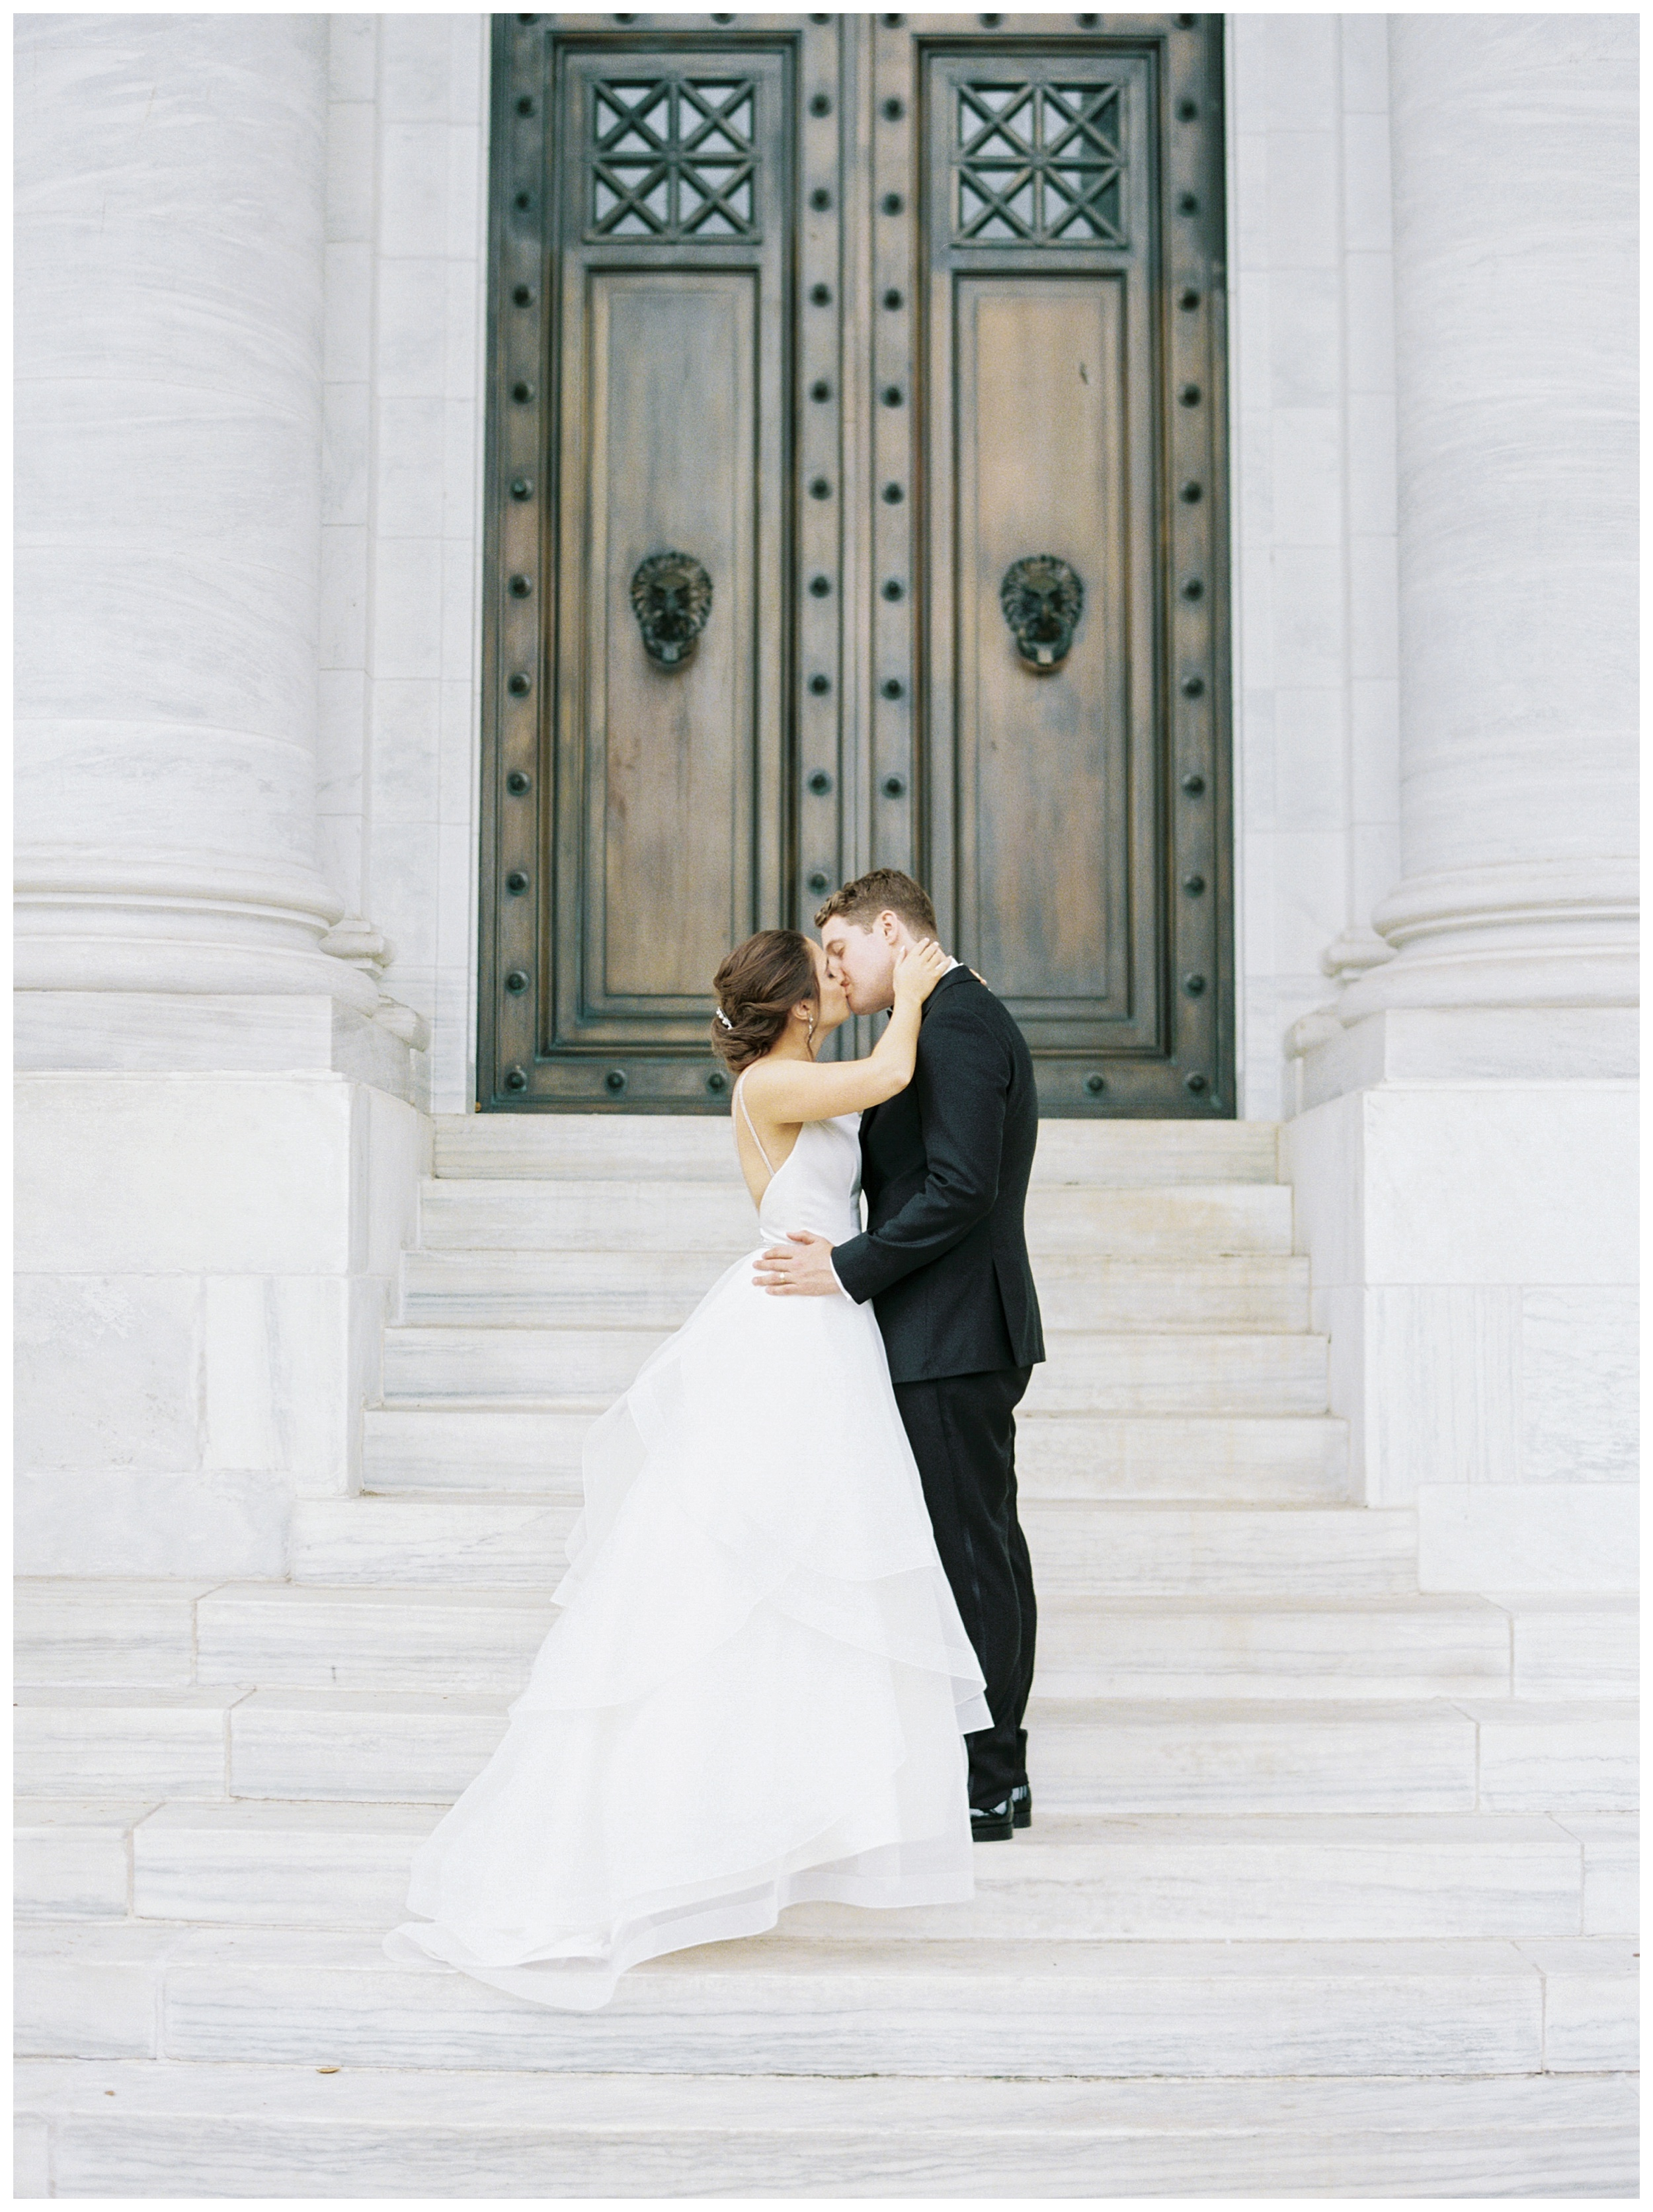 DAR Constitution Hall Wedding Wedding | Daughters of the American Revolution Wedding | District of Columbia Film Wedding Photographer Kir Tuben_0094.jpg